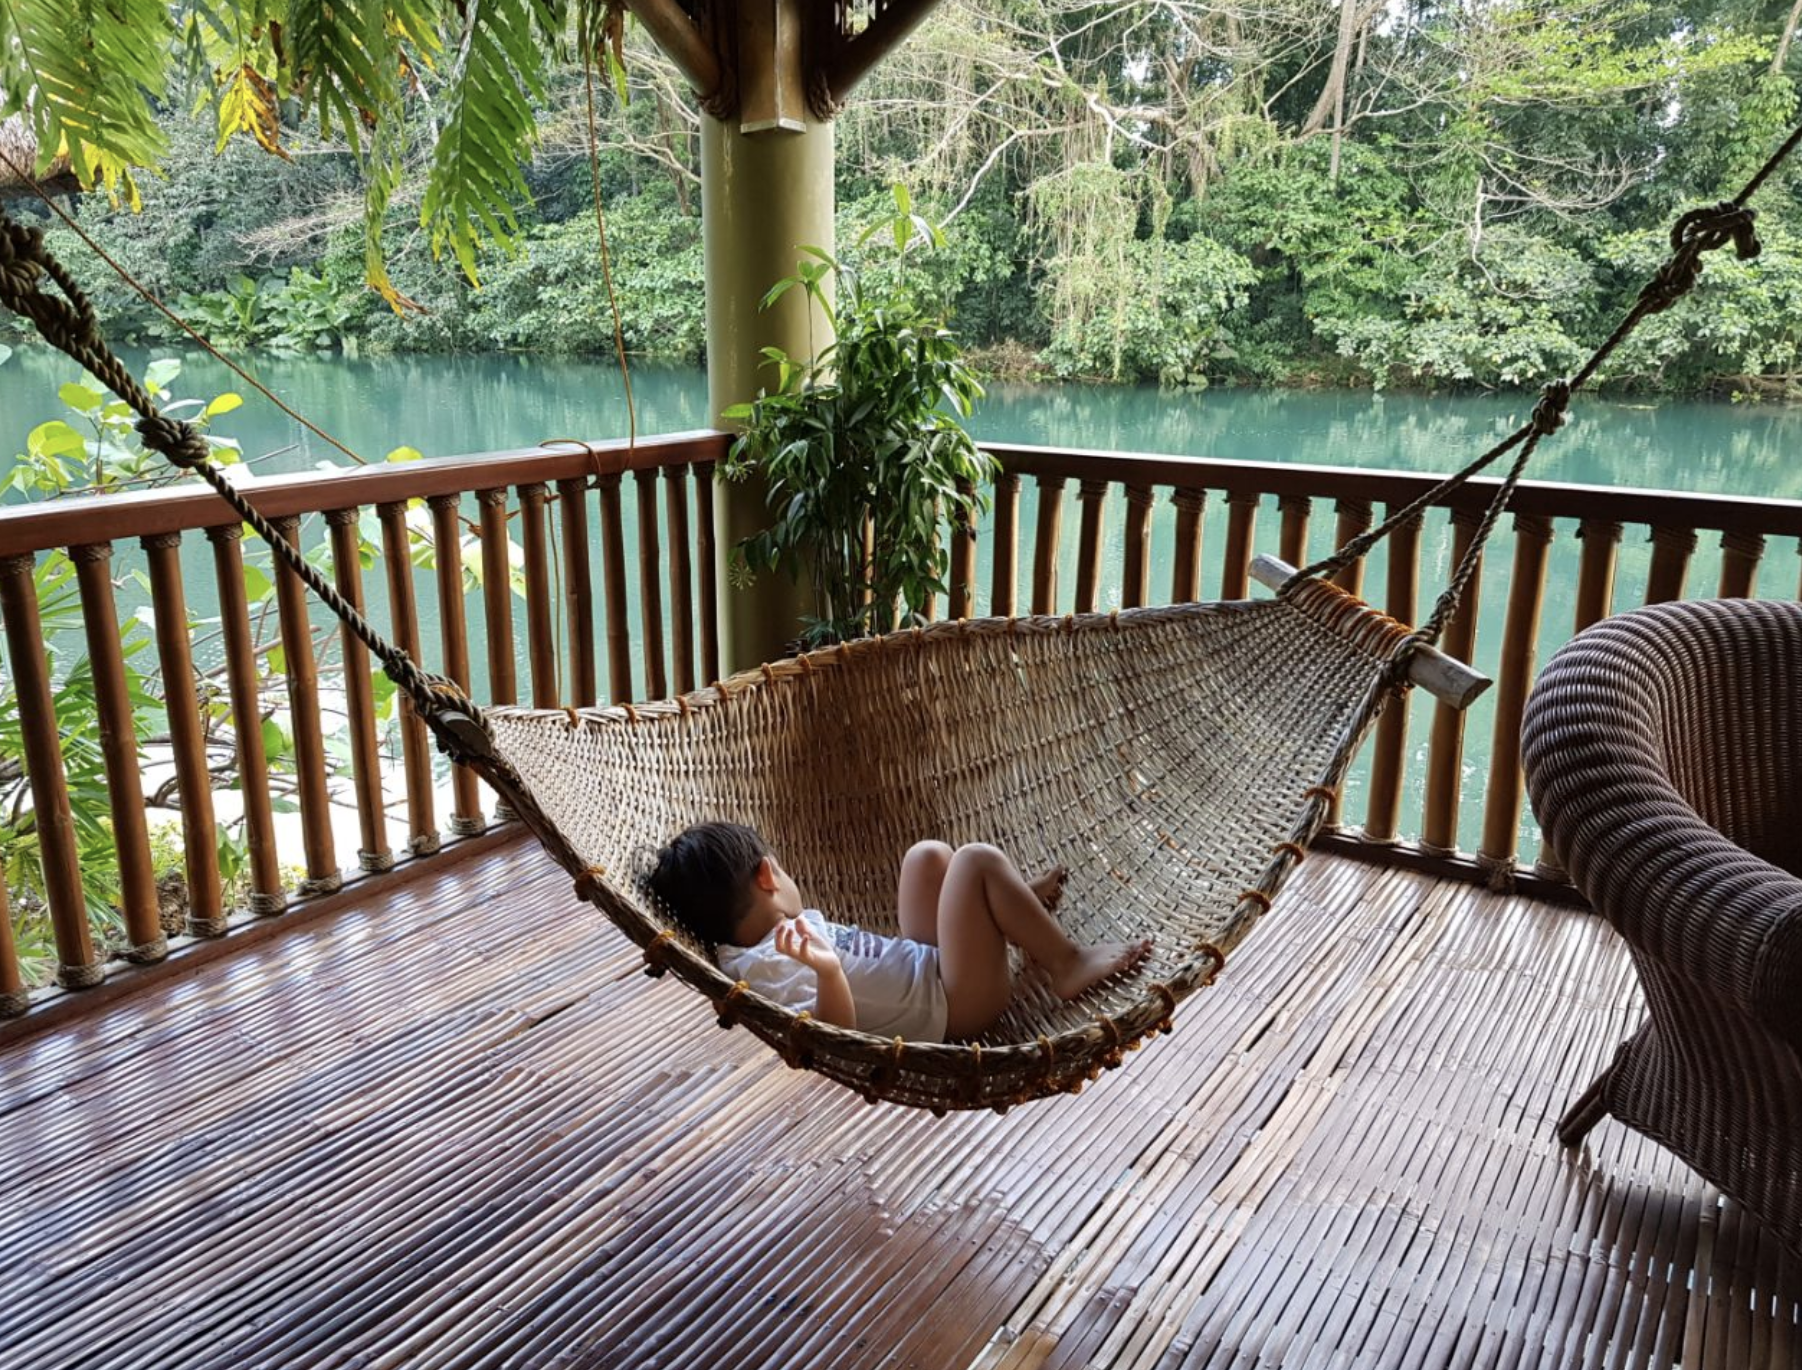 inigo in a hammock.png